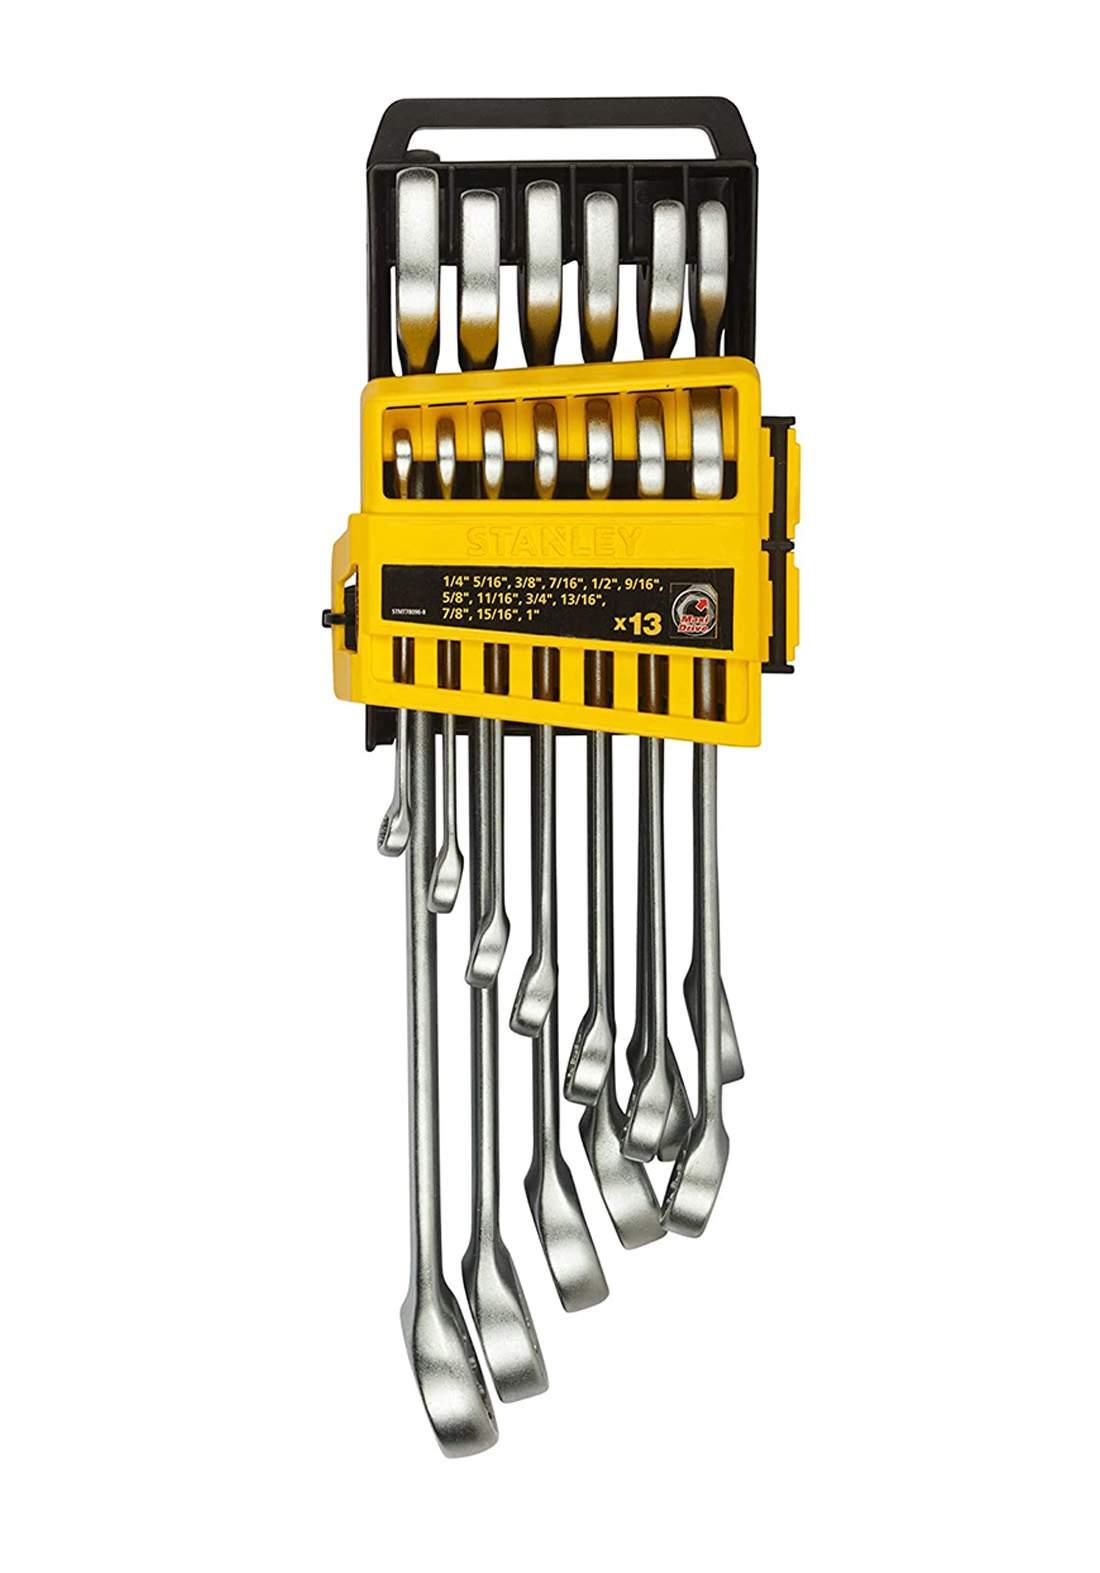 Stanley STMT78096-8 Combination Spanner Set 13Pcs سيت مفاتيح ربط